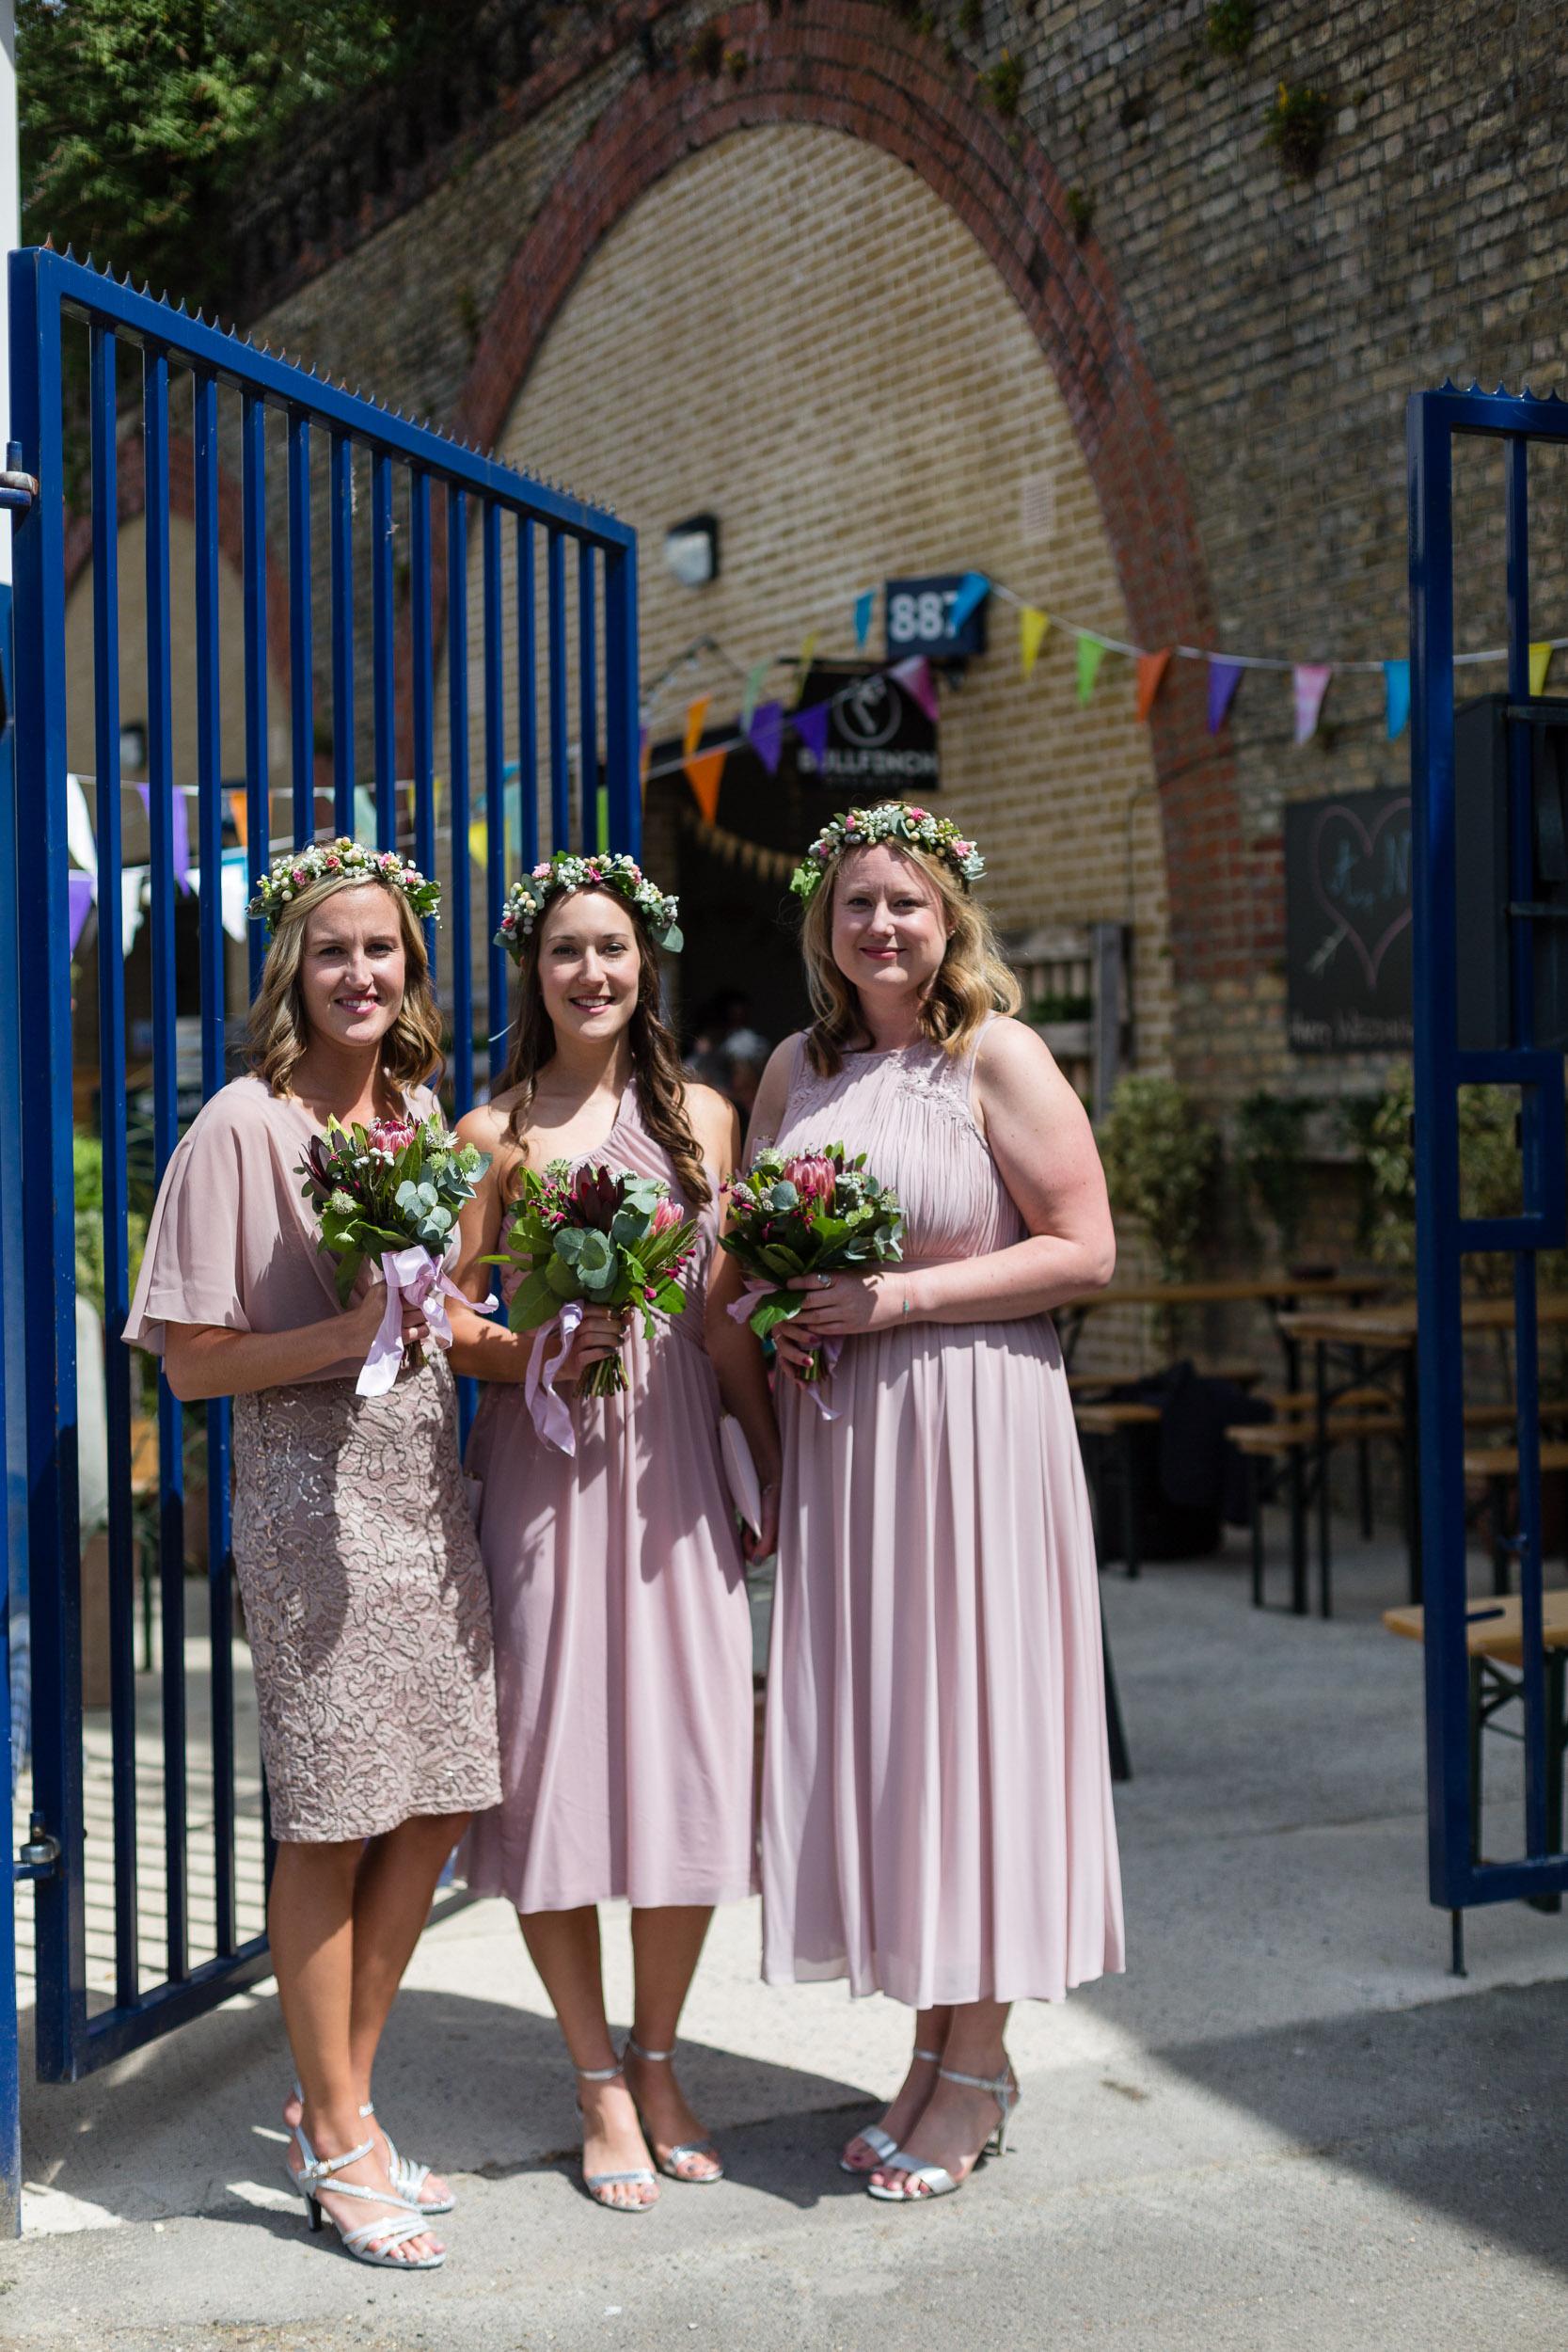 brockwell-lido-brixton-herne-hill-wedding-023.jpg